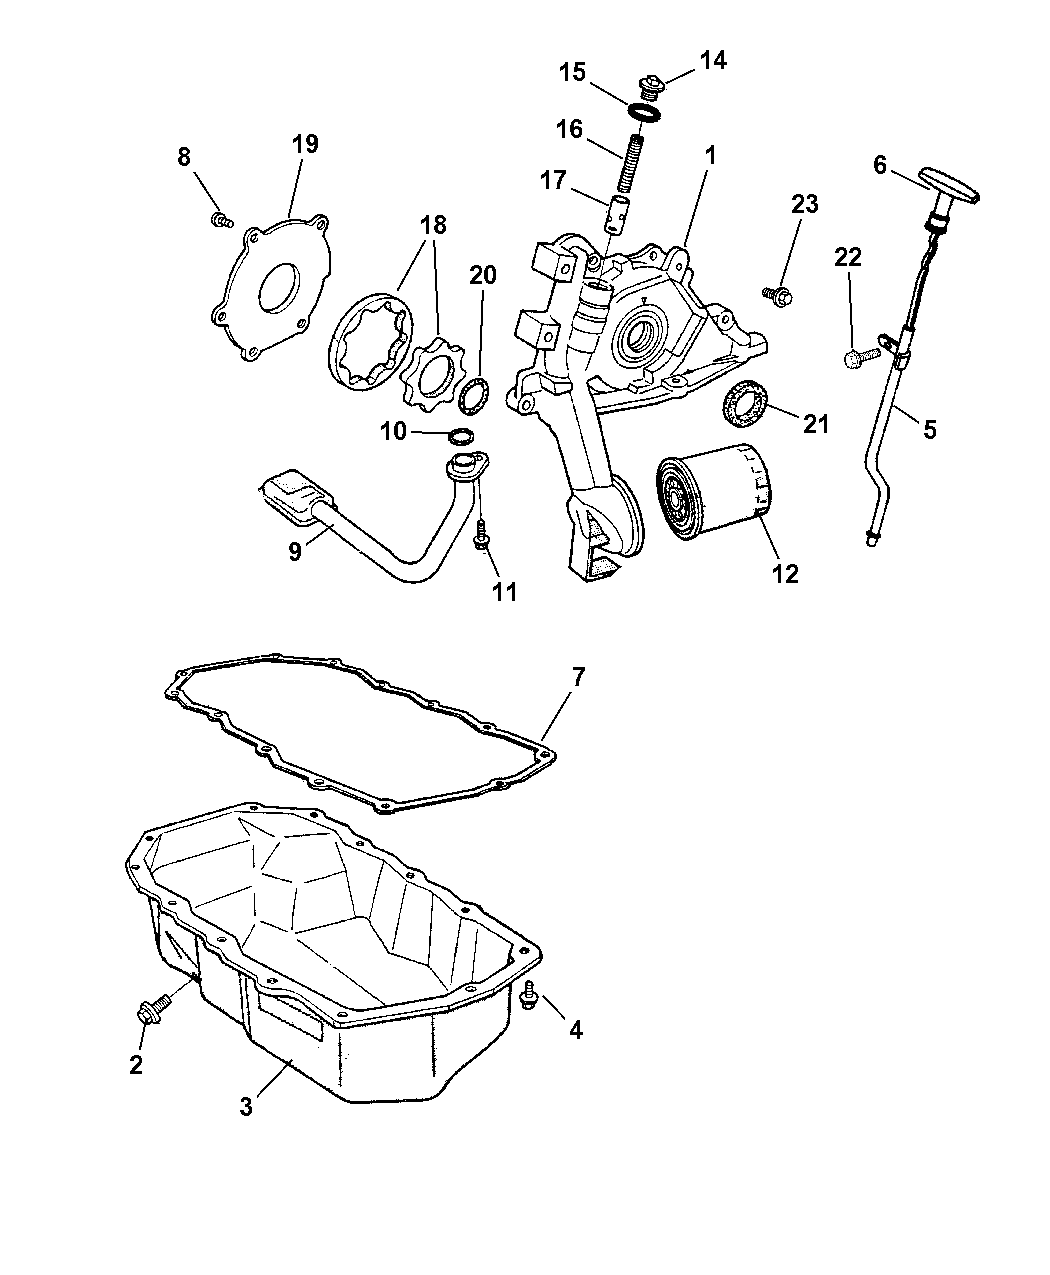 Wiring Diagram PDF: 2003 Dodge Caravan Engine Diagram